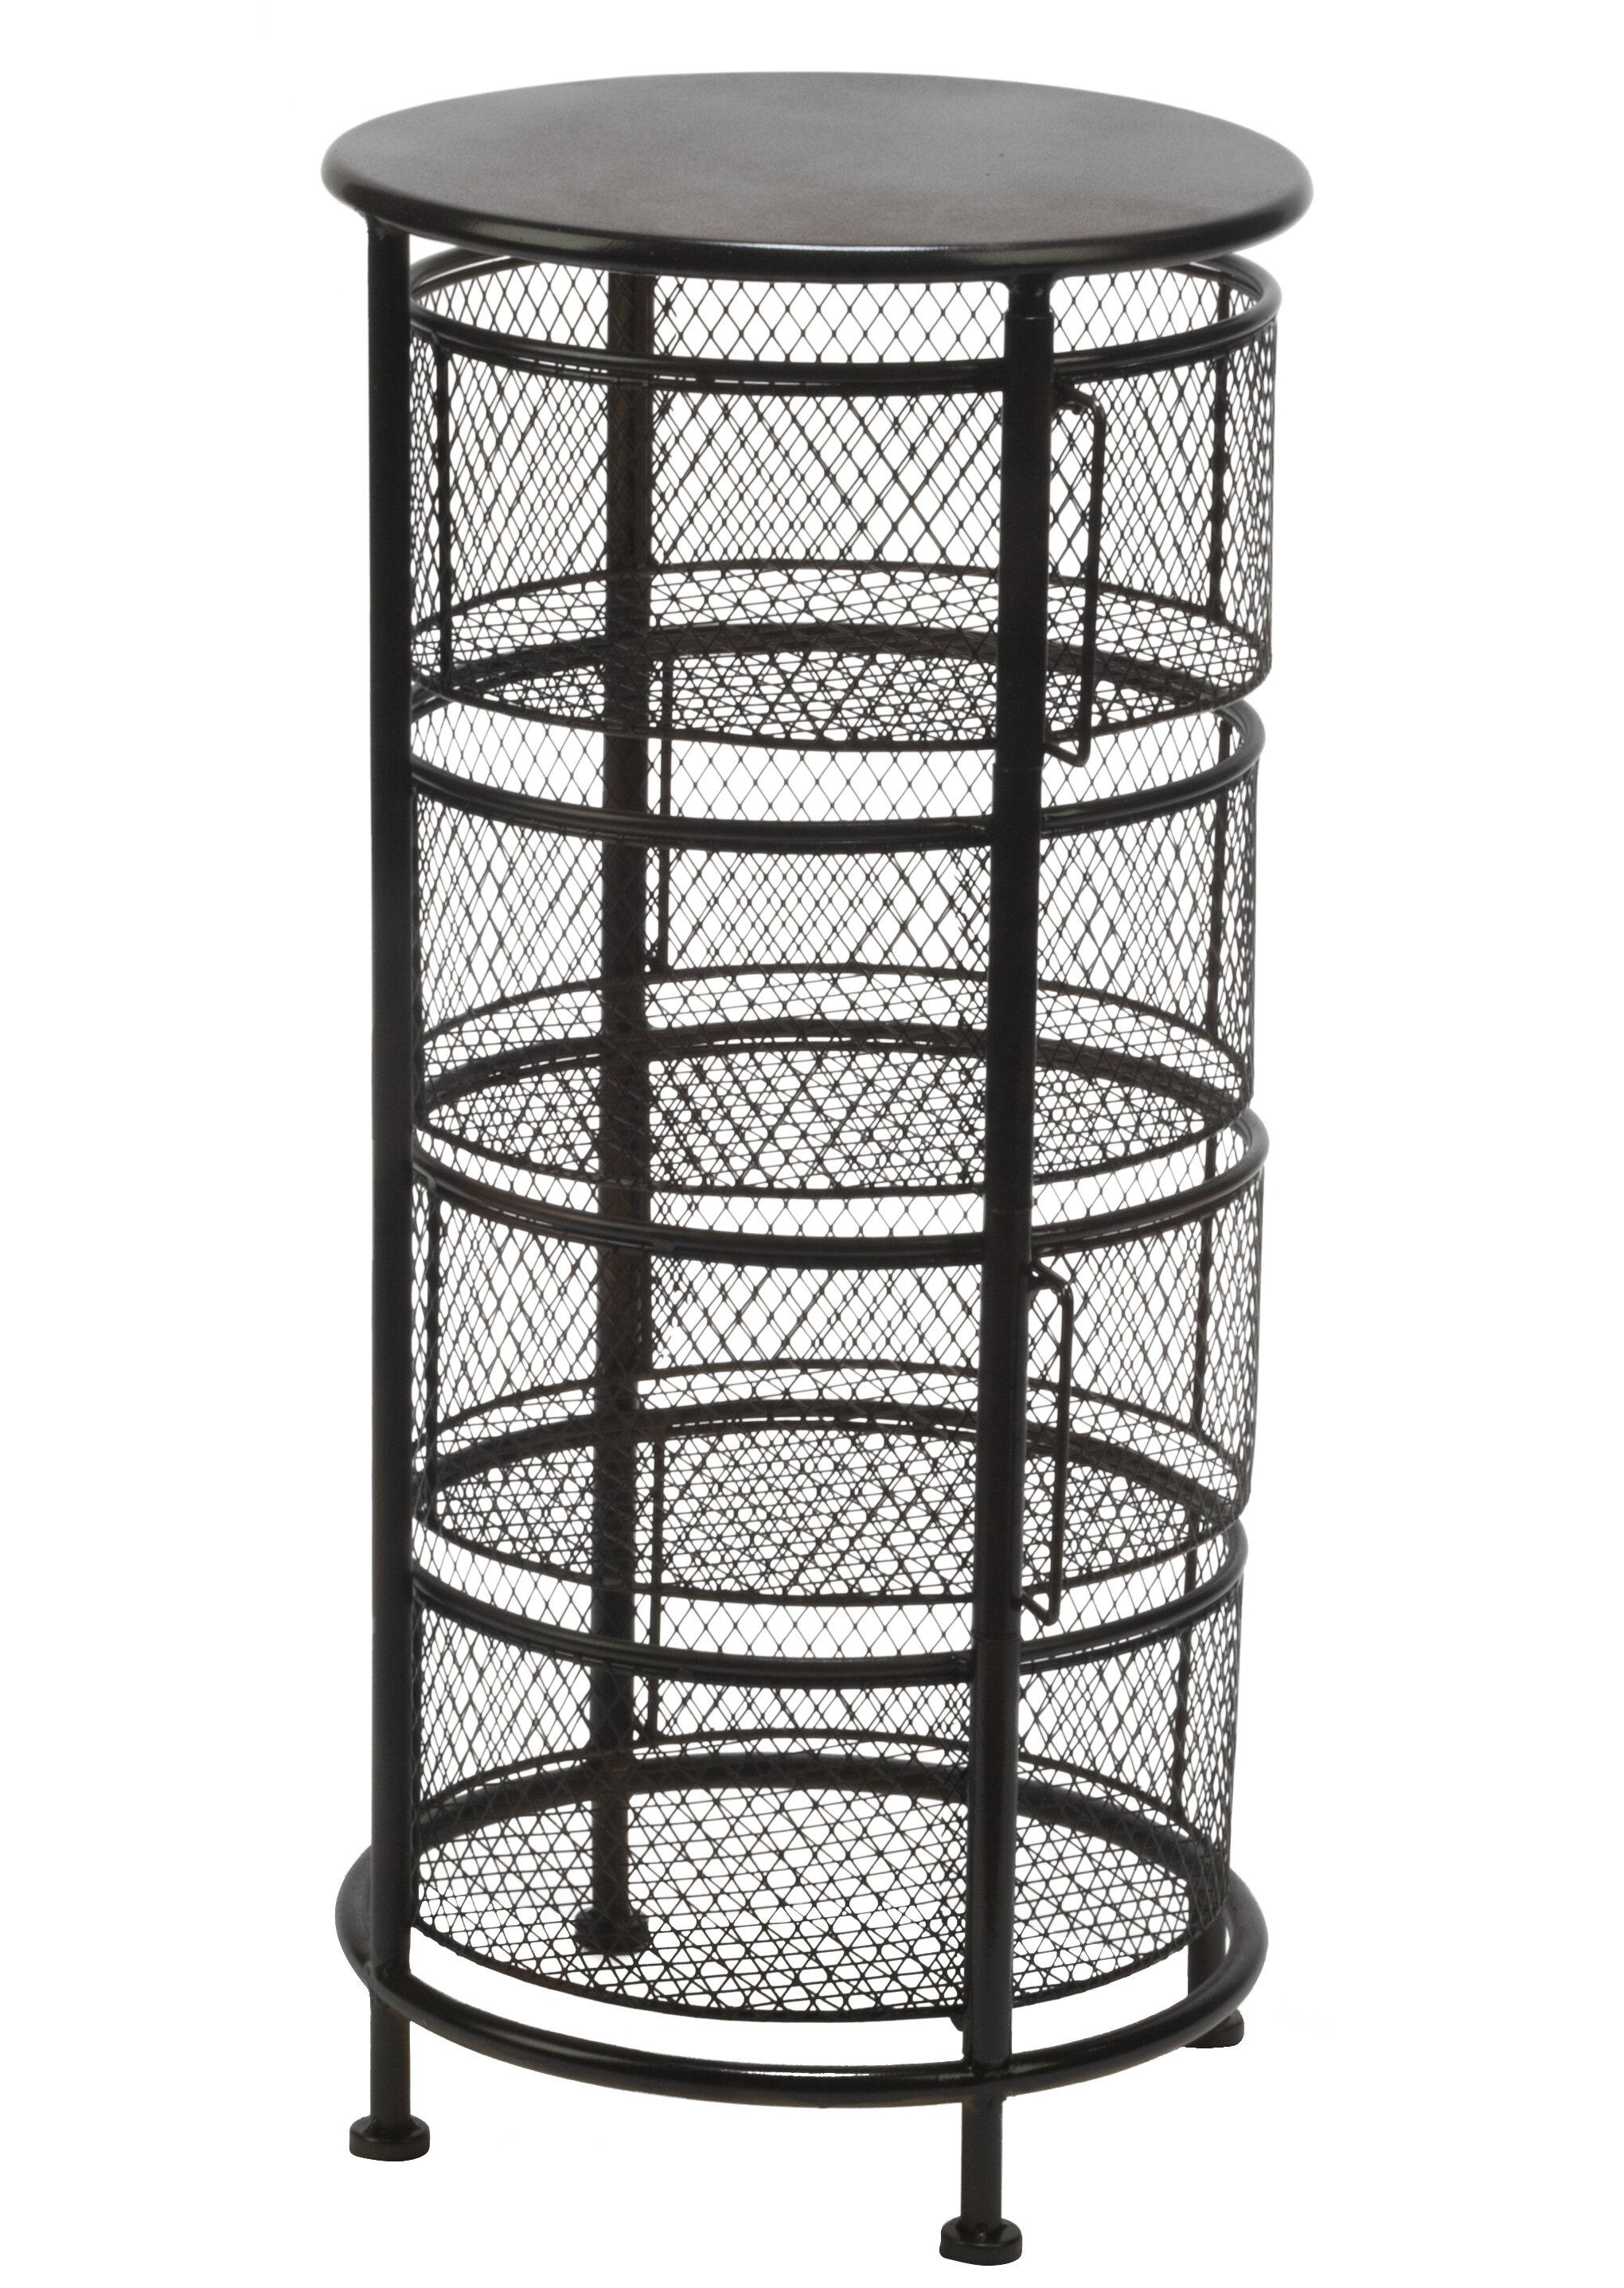 Incroyable Williston Forge Meisel Bin Mesh Swivel Display 4 Drawer Storage Chest |  Wayfair